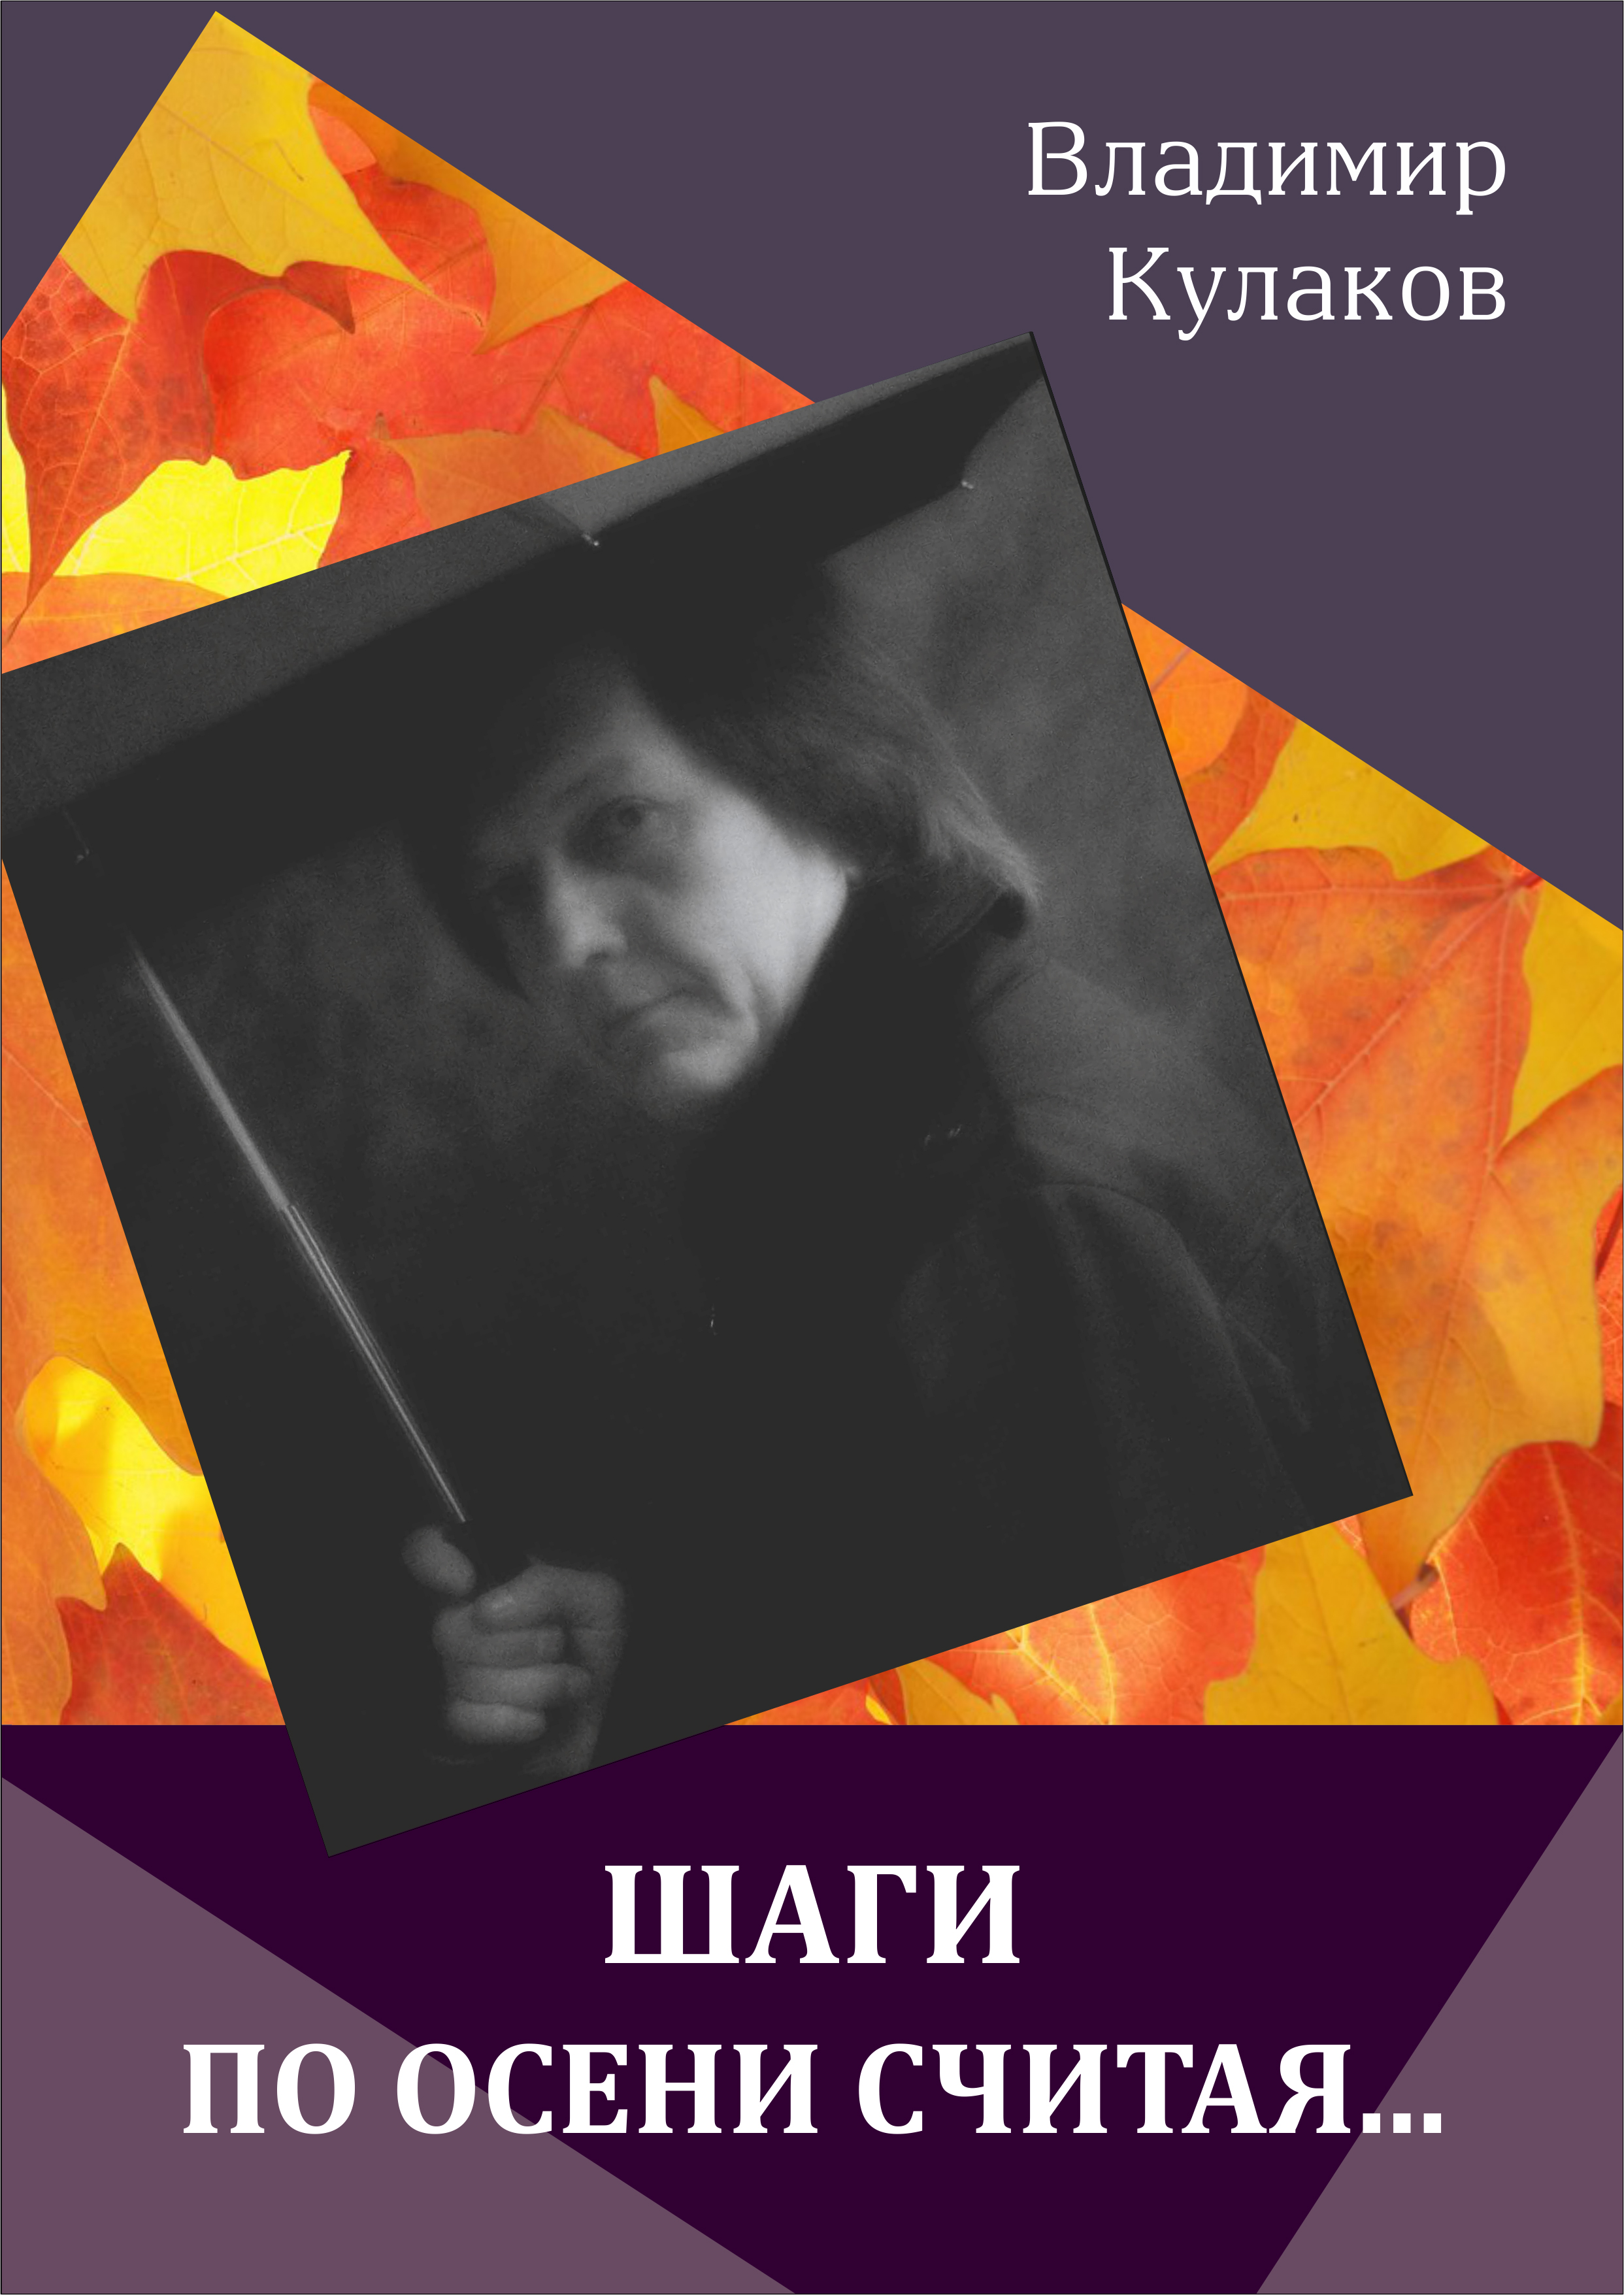 Шаги по осени считая… (сборник)